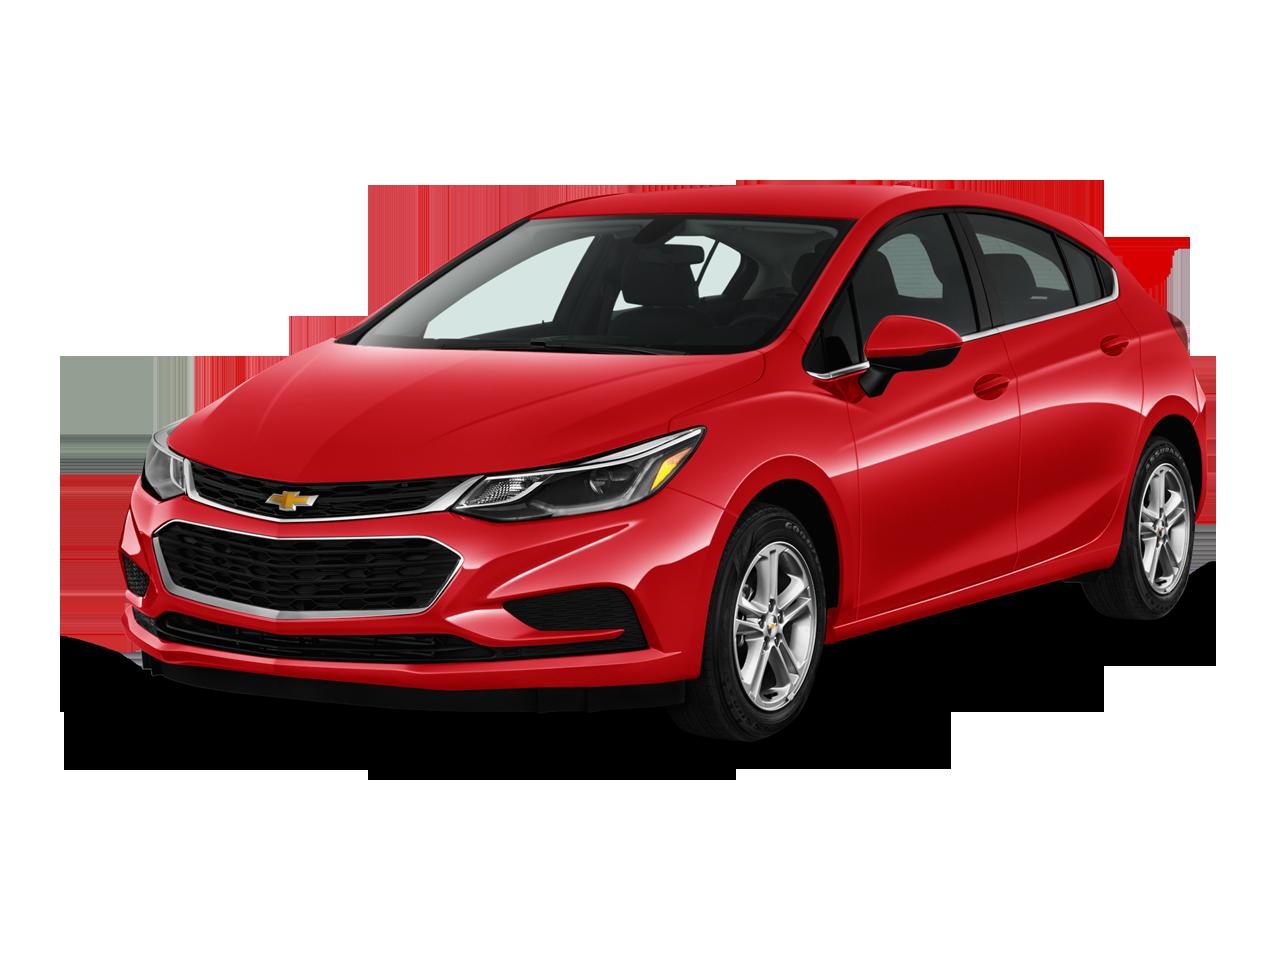 New 2018 Chevrolet Cruze LT - West Salem WI - Brenengen Auto